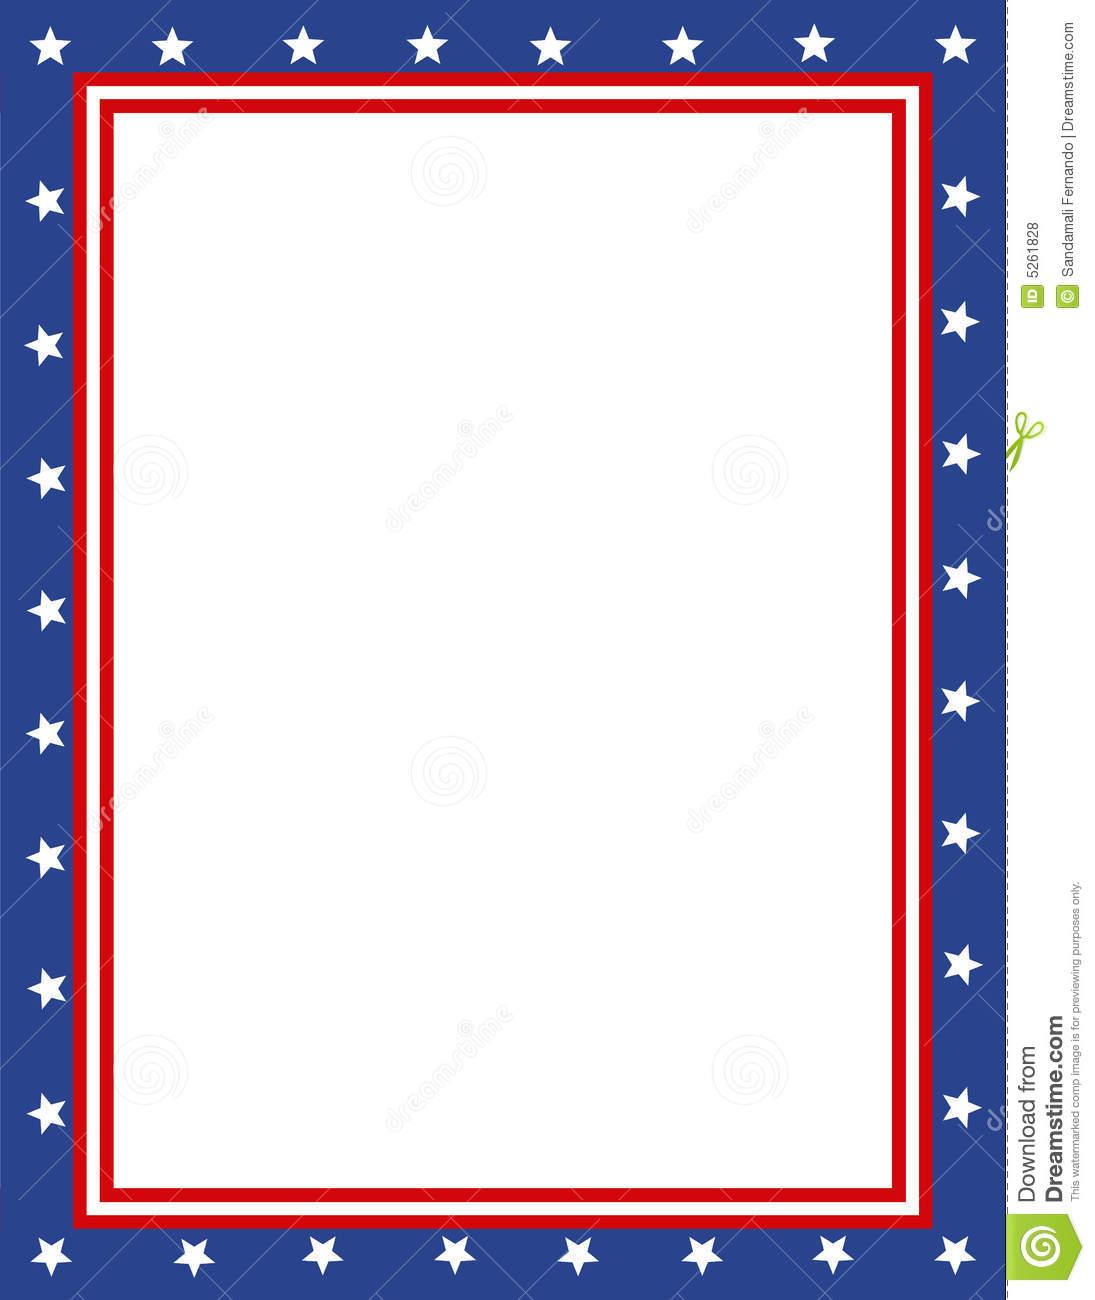 Patriotic Borders Clipart.